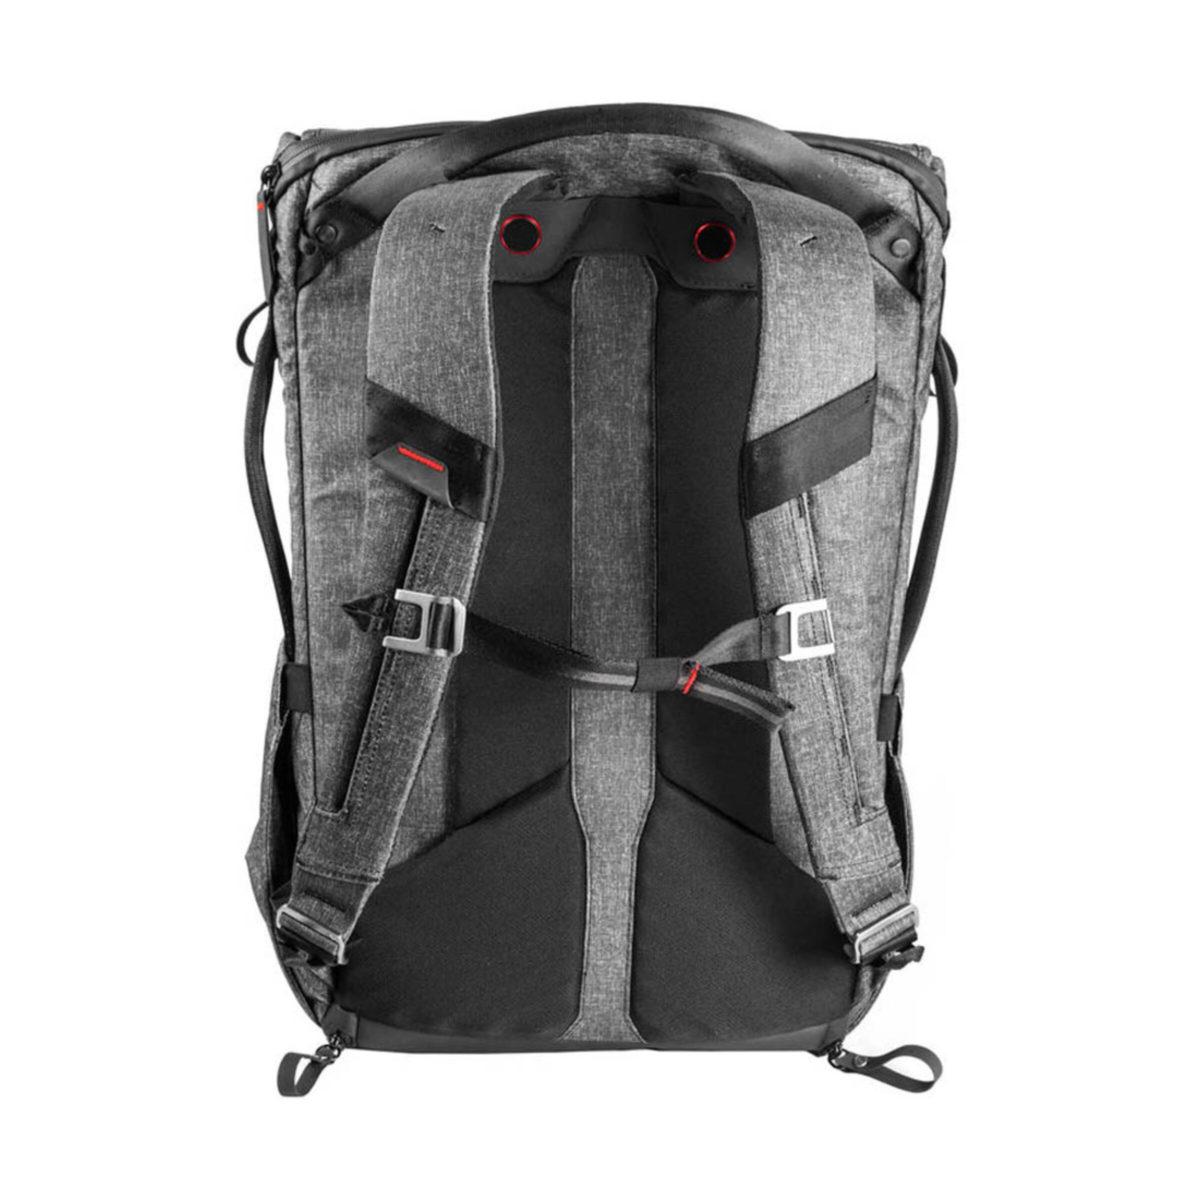 peak_design_everyday_backpack_30l_cc_05